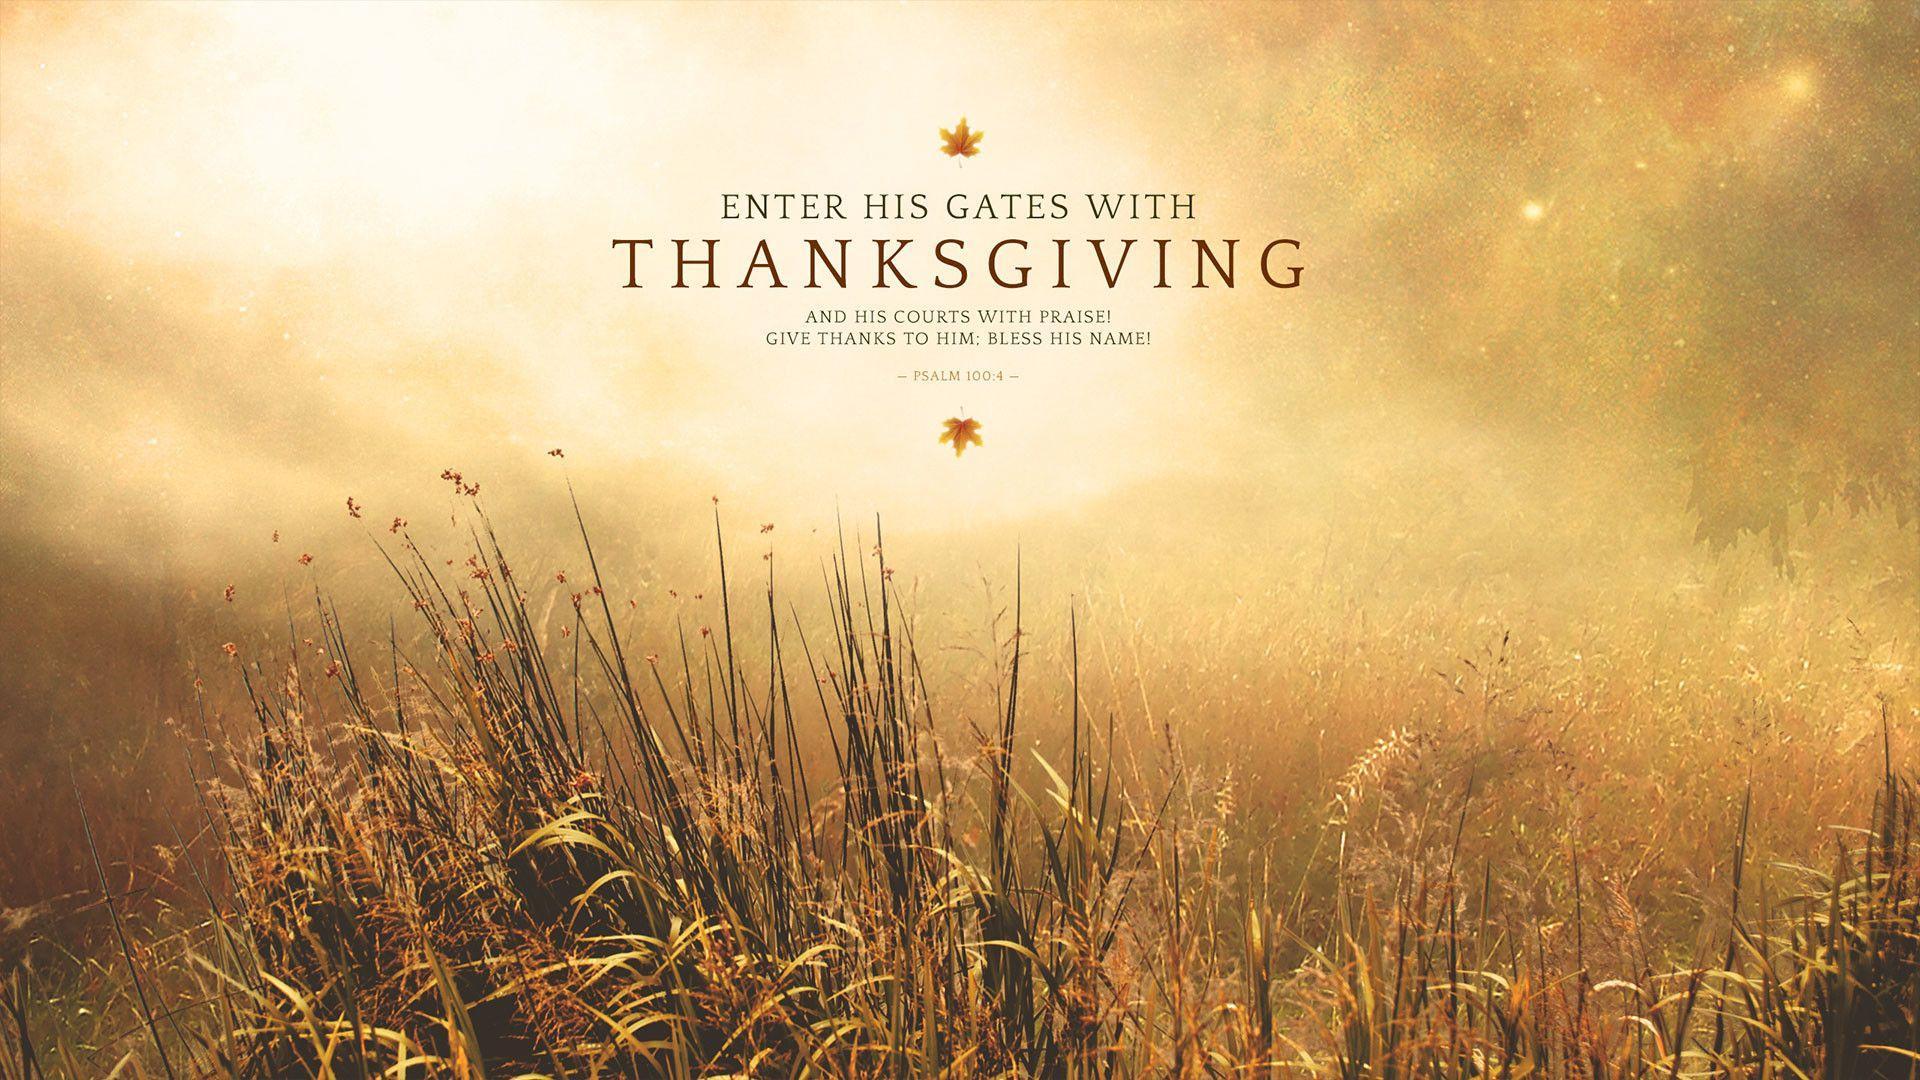 Religious Thanksgiving Wallpapers Top Free Religious Thanksgiving